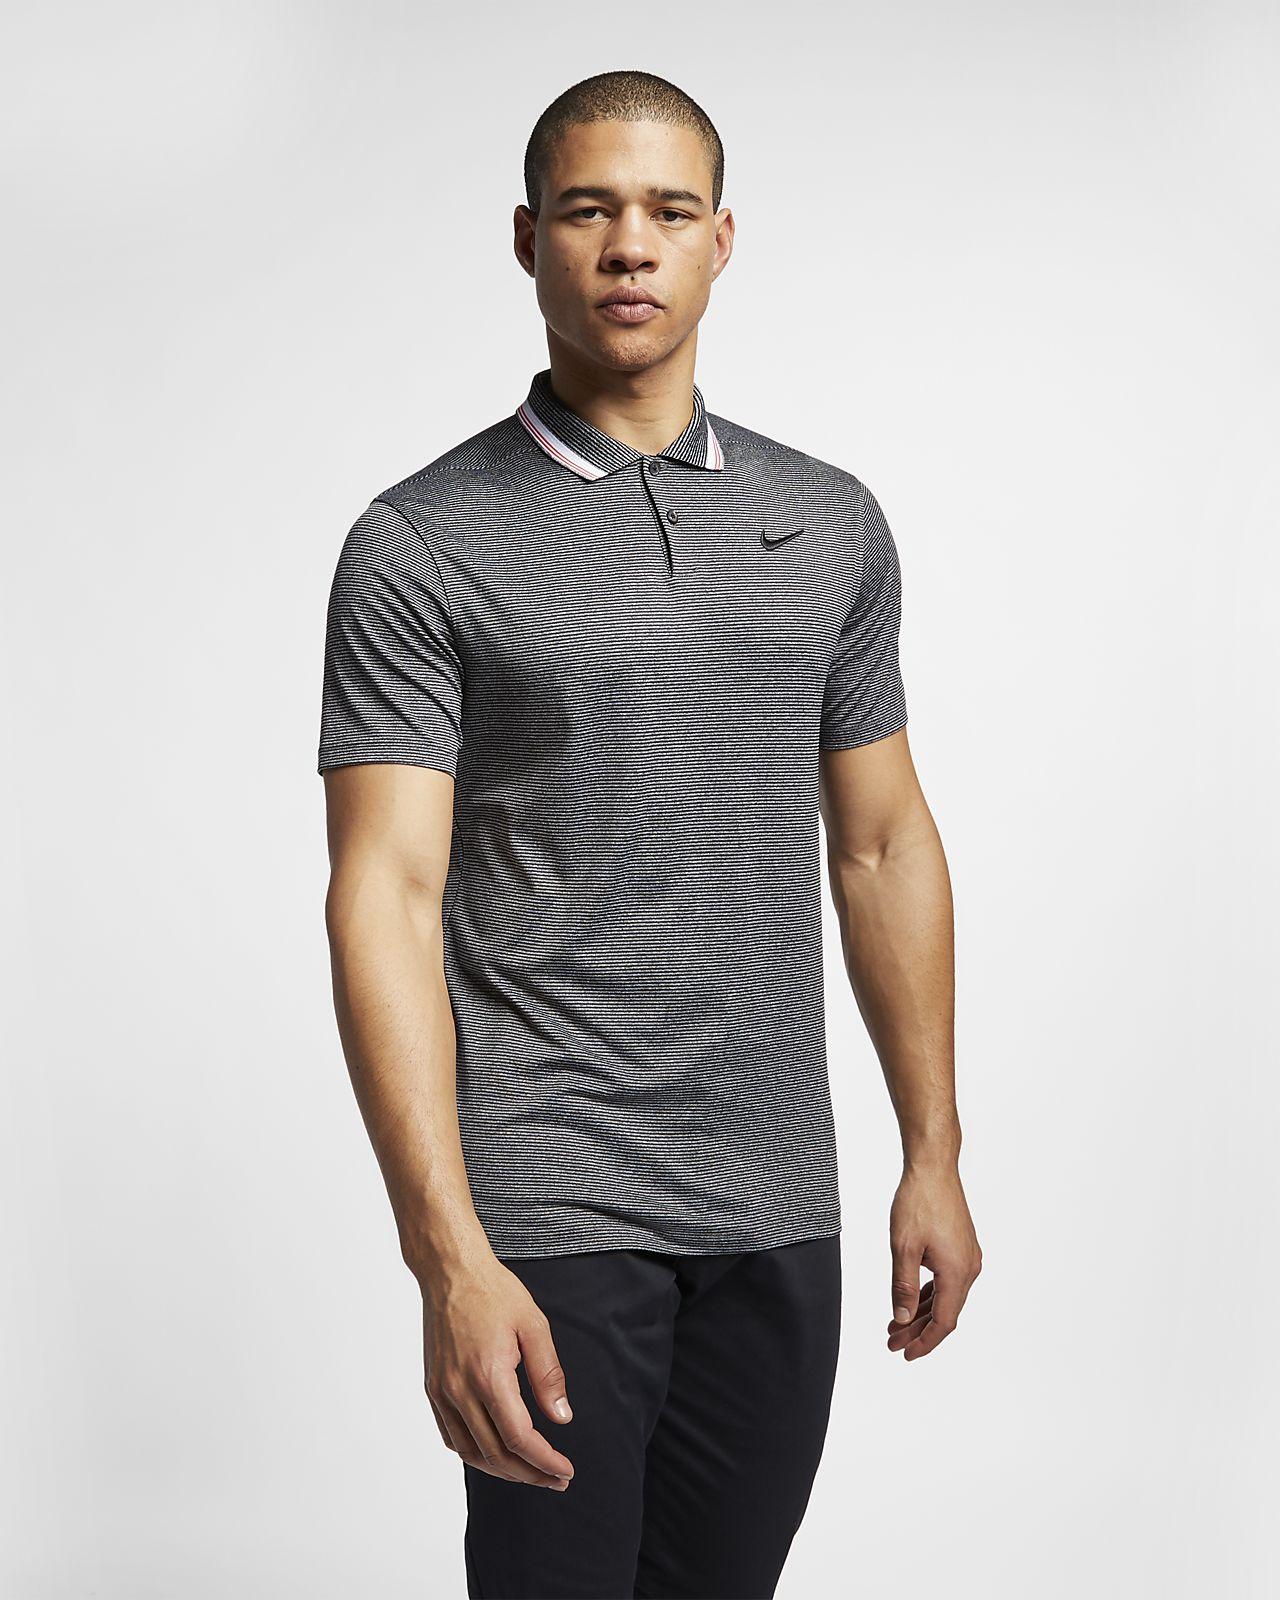 94f567e31 Nike Dri-FIT Vapor Men s Golf Polo. Nike.com GB